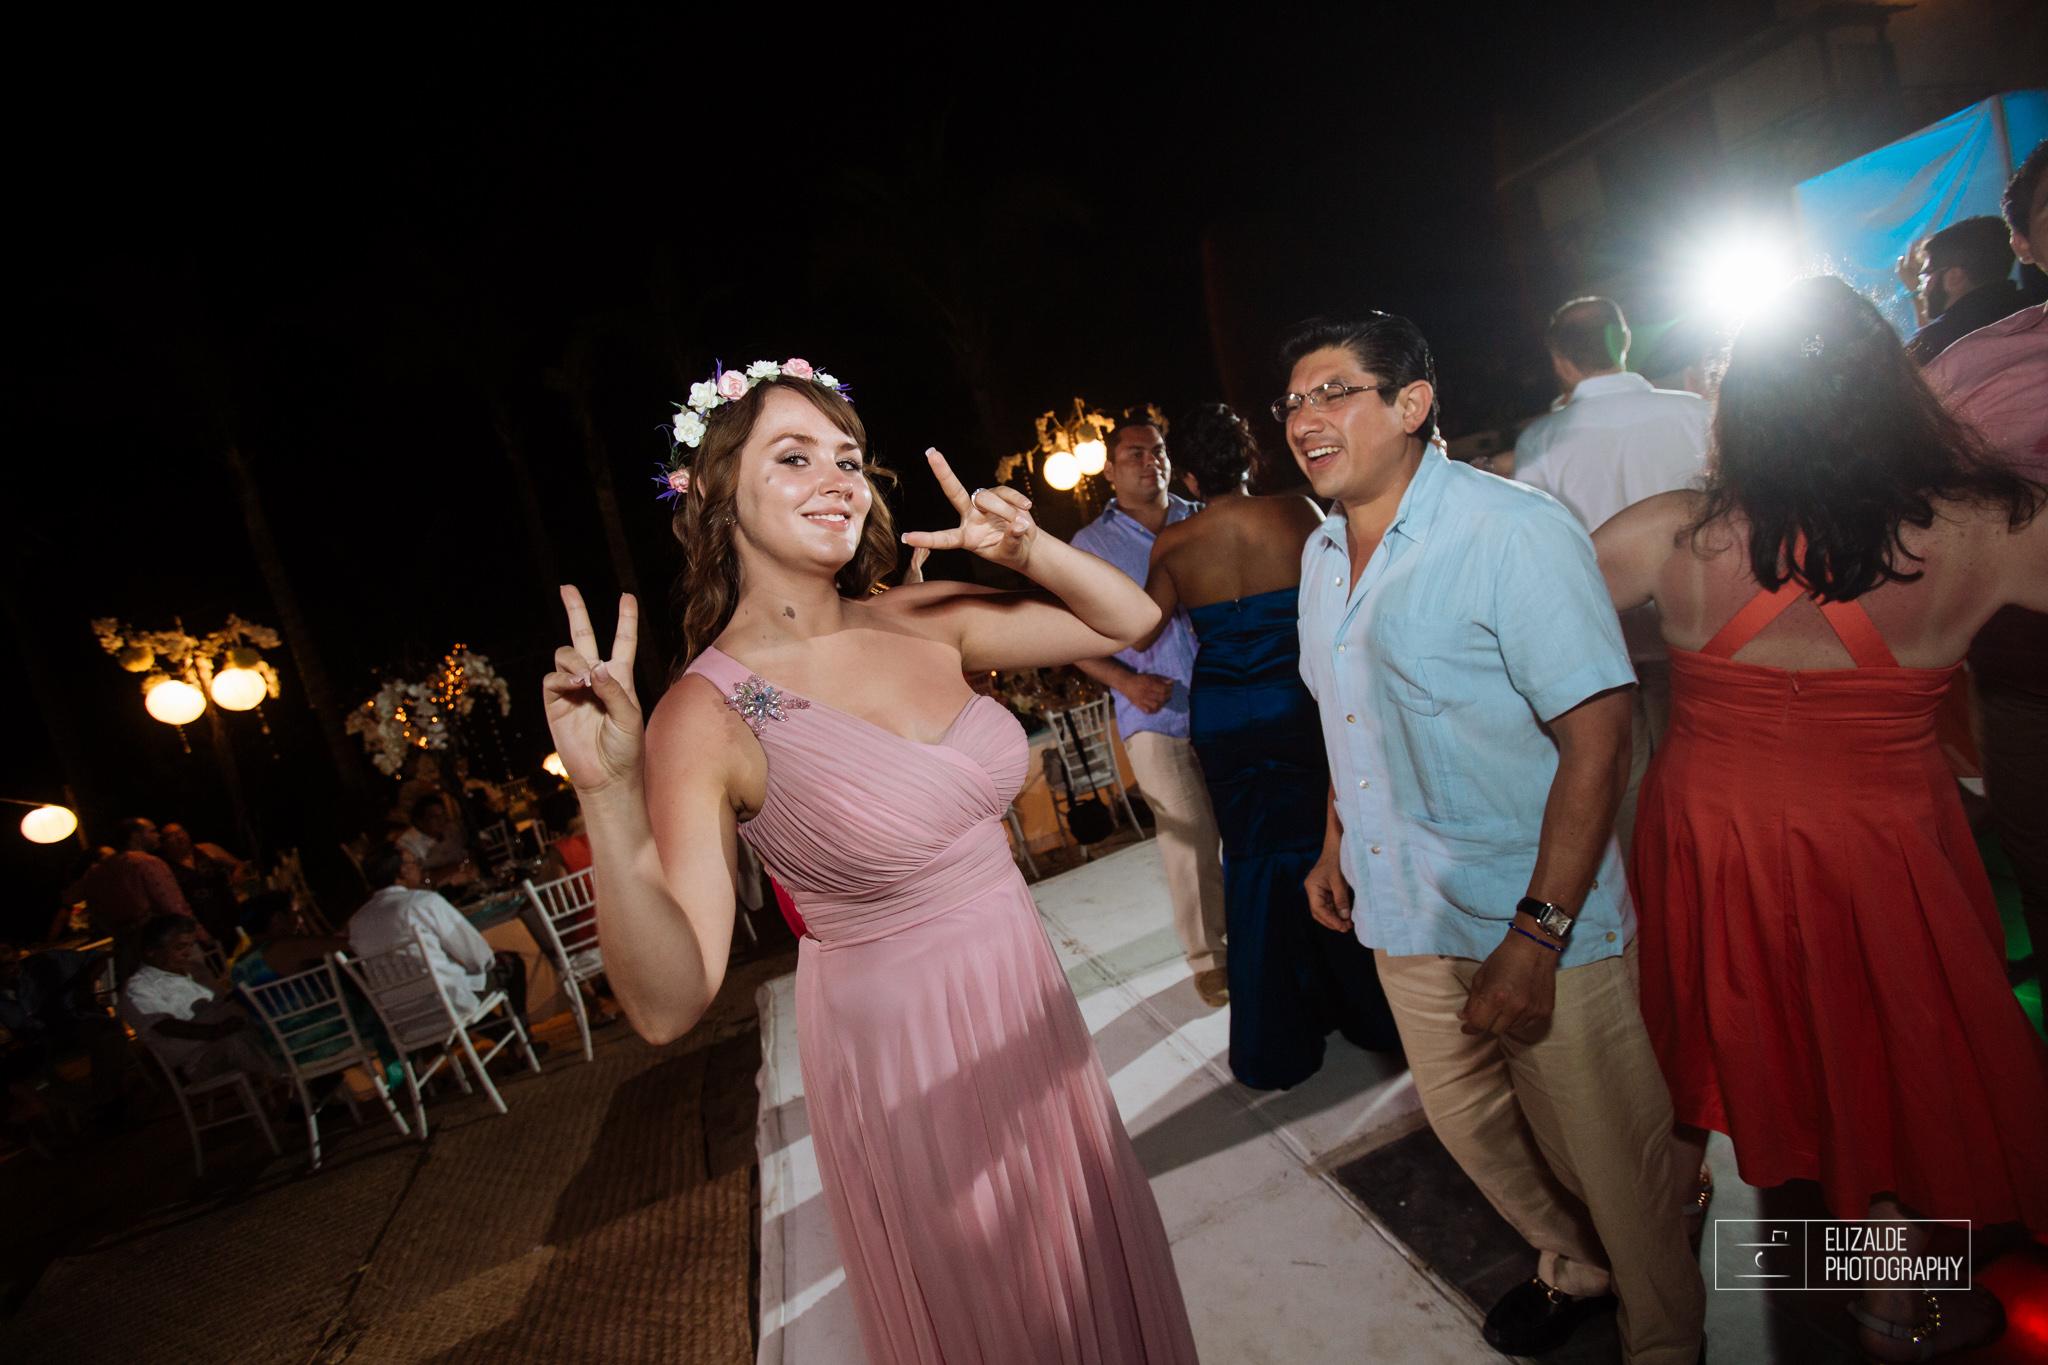 Pay and Ferran_Acapulco_Destination Wedding_Elizalde Photography-116.jpg